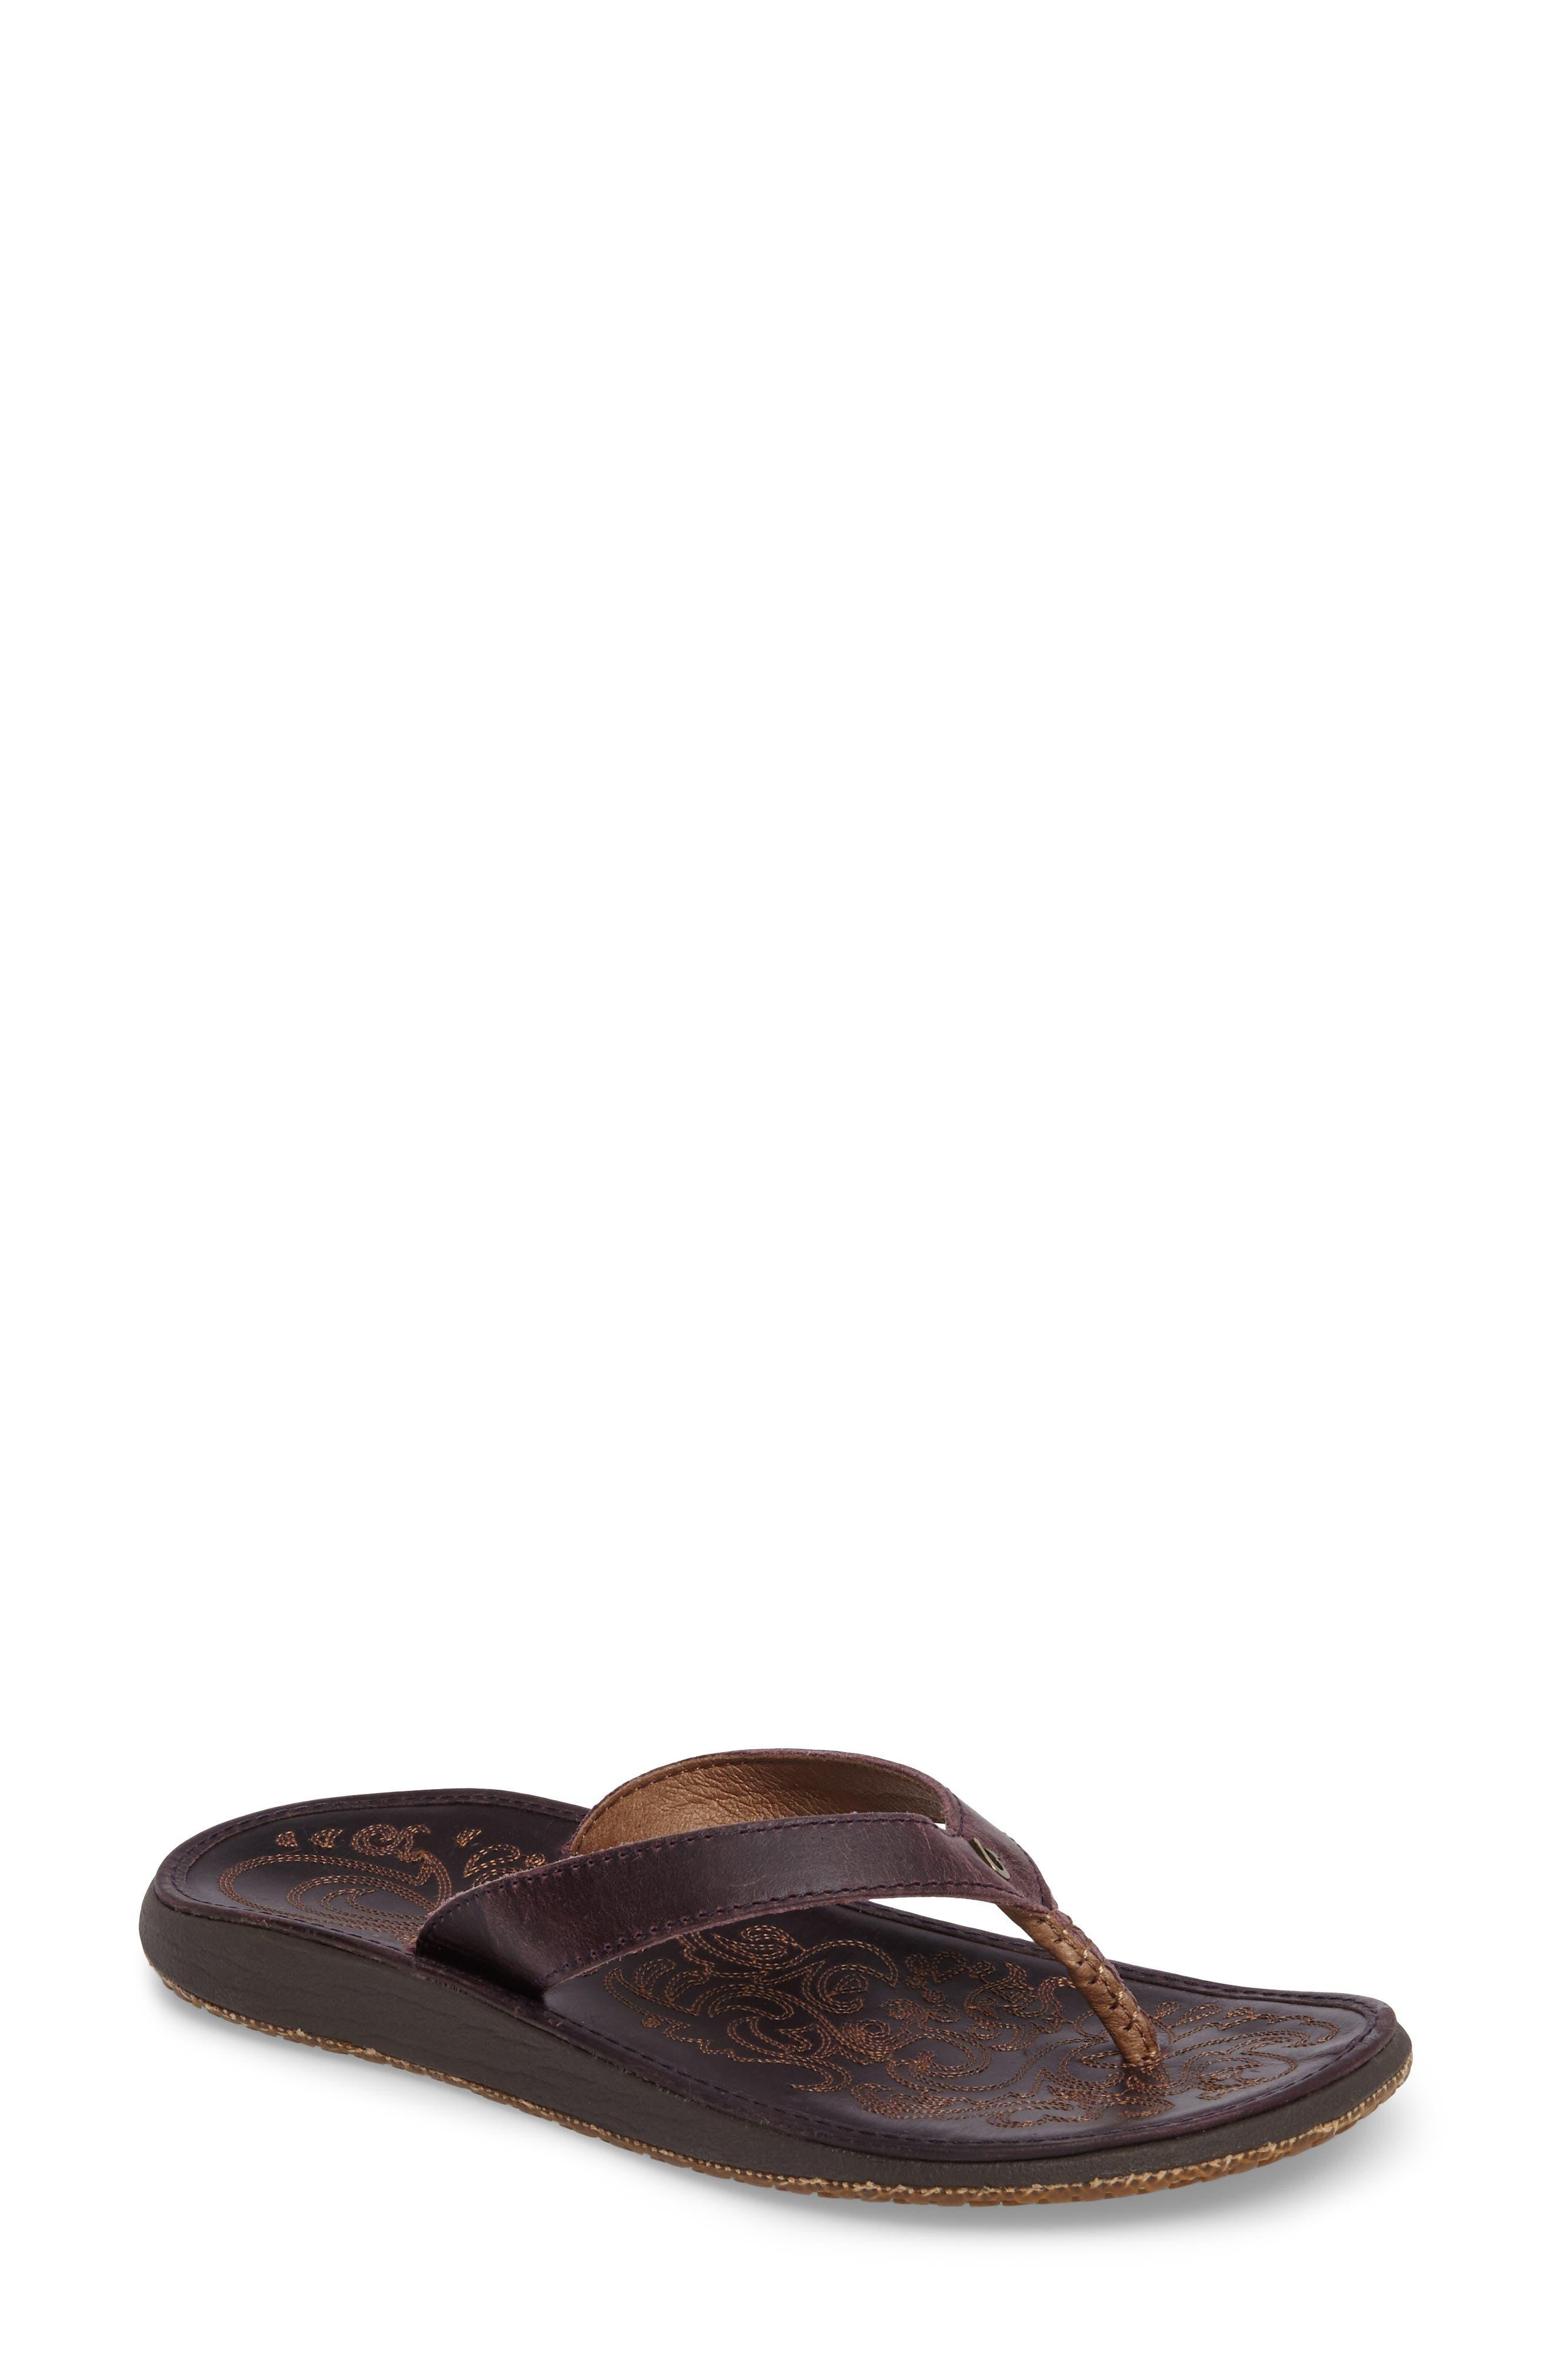 Alternate Image 1 Selected - OluKai 'Paniolo' Thong Sandal